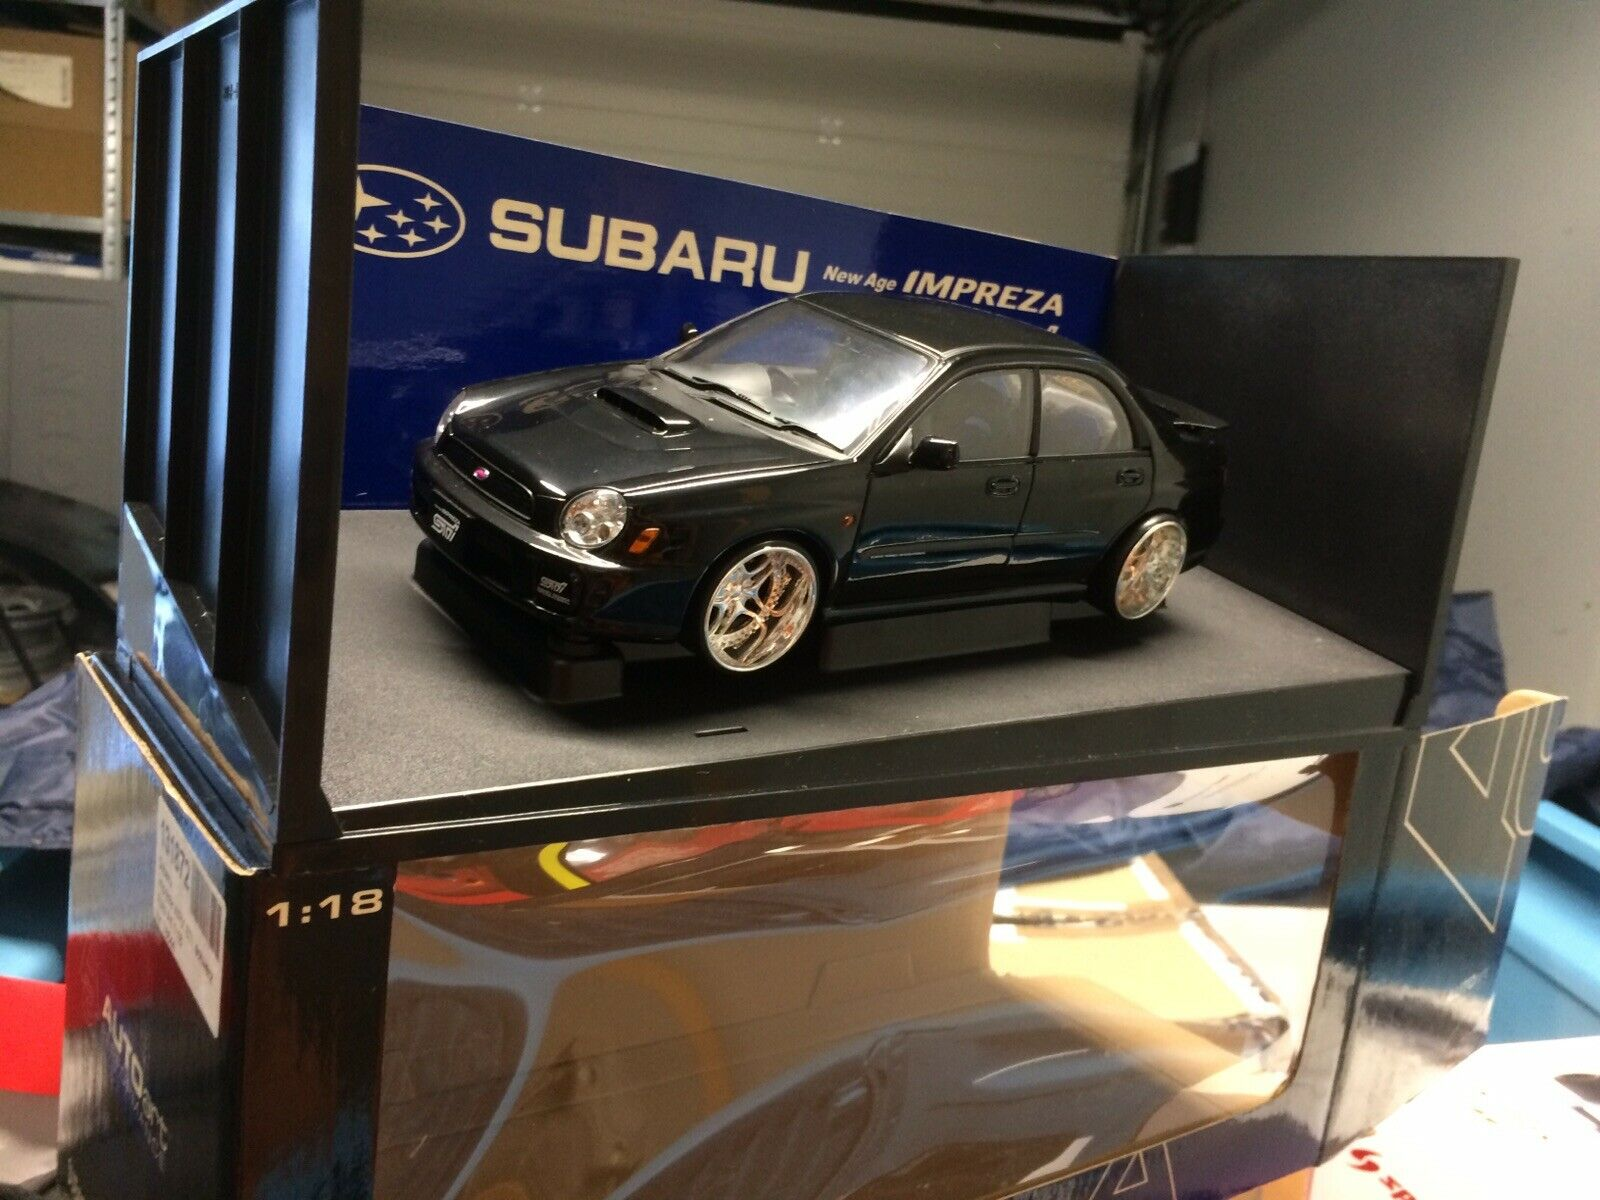 Autoart Subaru Impreza Wrx Sti  1 18 Tuning  pas cher et de haute qualité